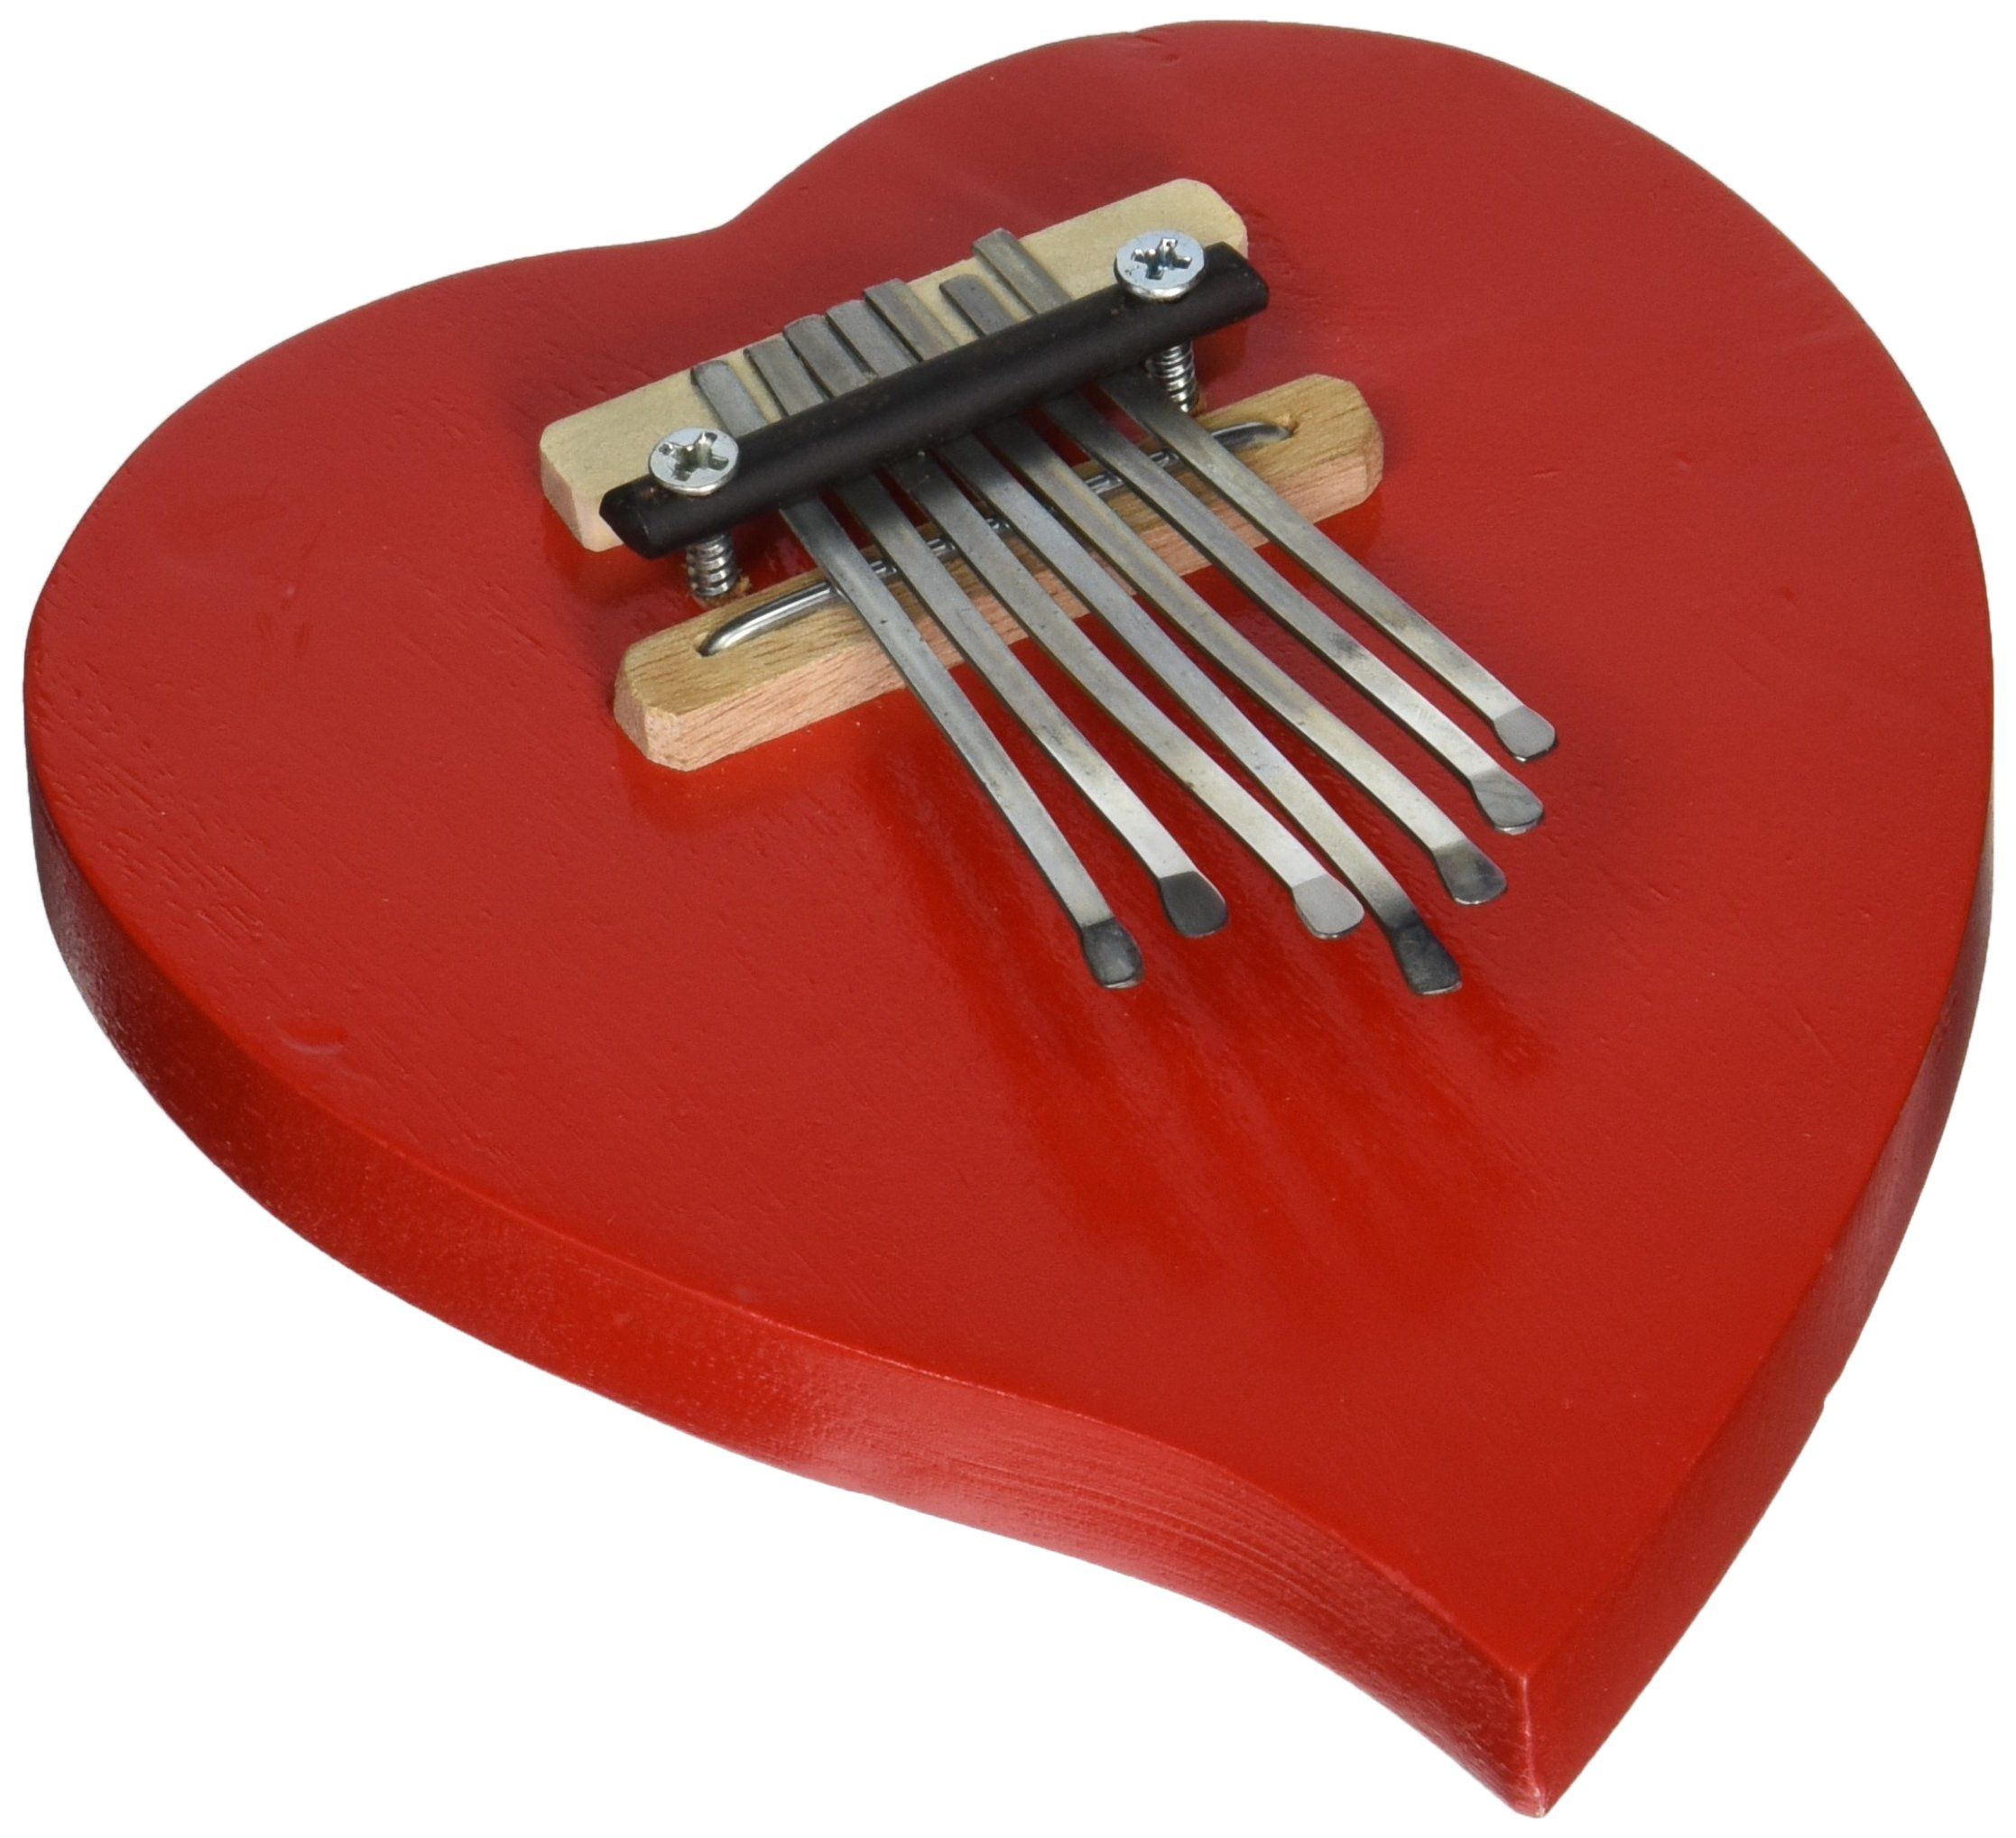 X8 Drums Red Heart Kalimba Thumb Piano